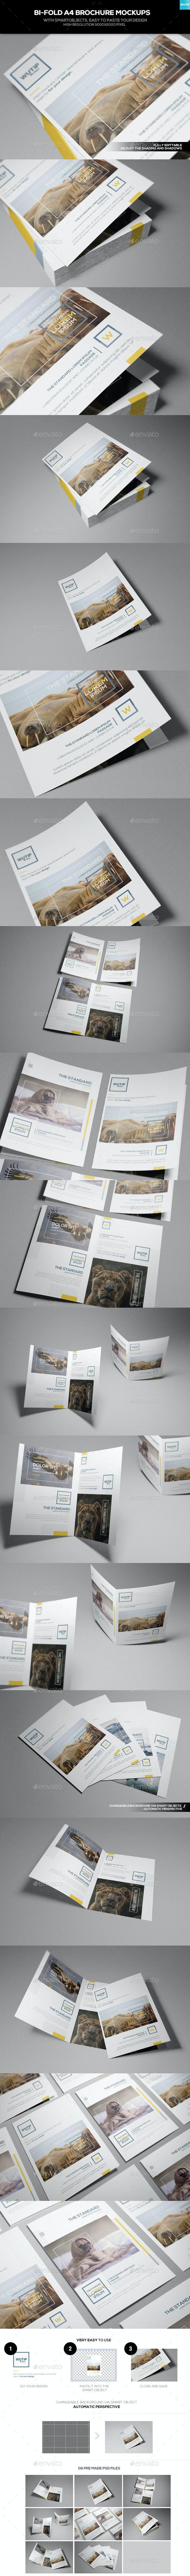 Bi-Fold A4 Brochure Mockups - Brochures Print